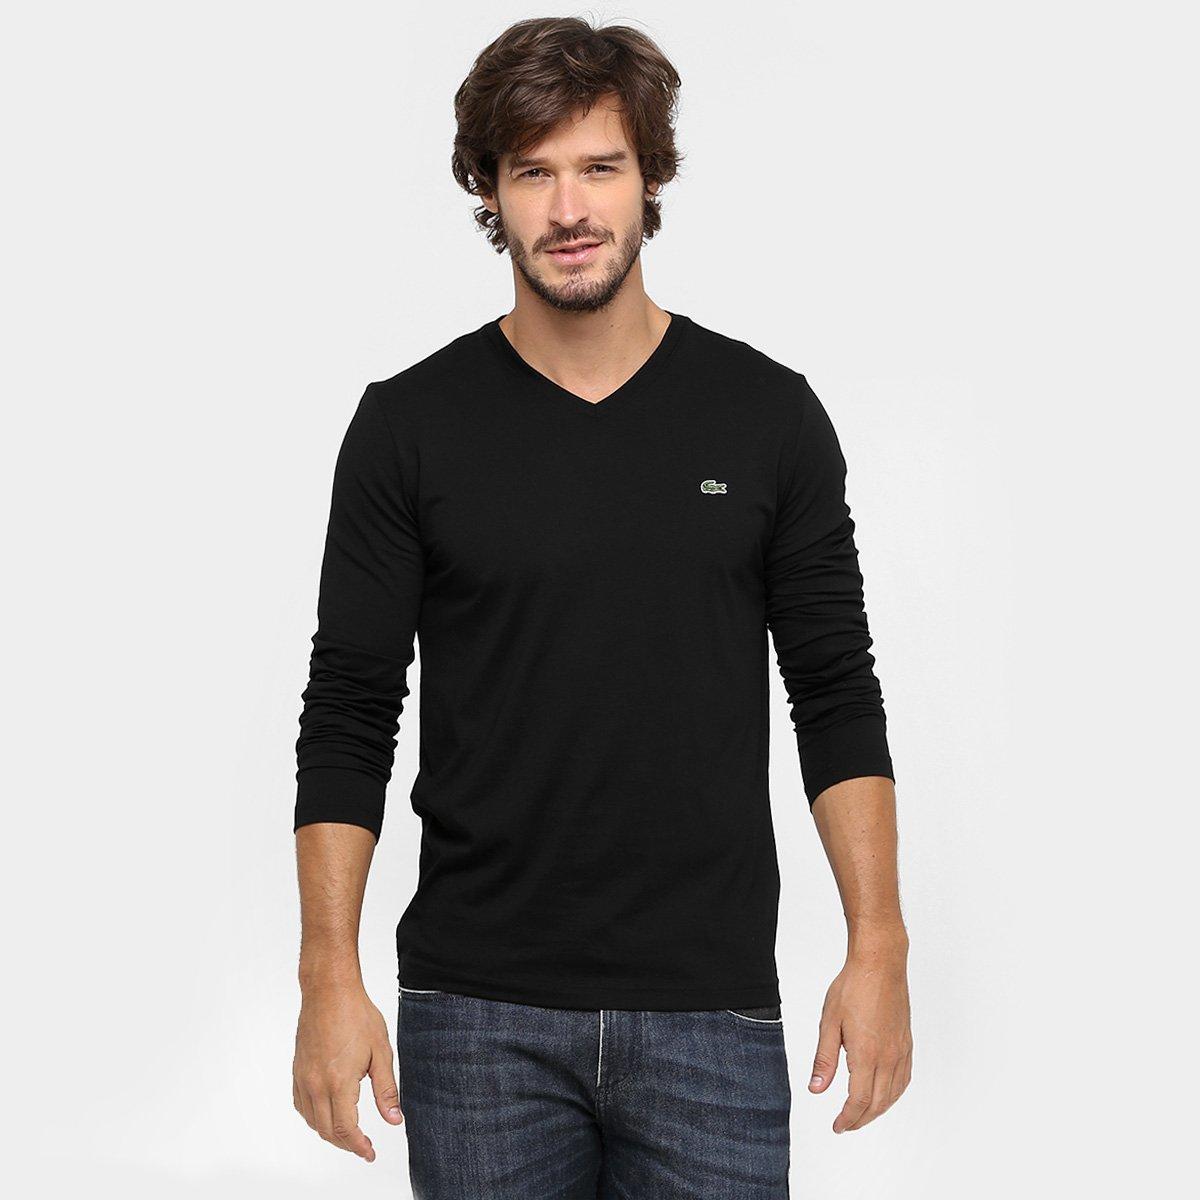 67acd3f2a7f87 Camiseta Lacoste Regular Fit Básica Gola V Manga Longa - Compre ...